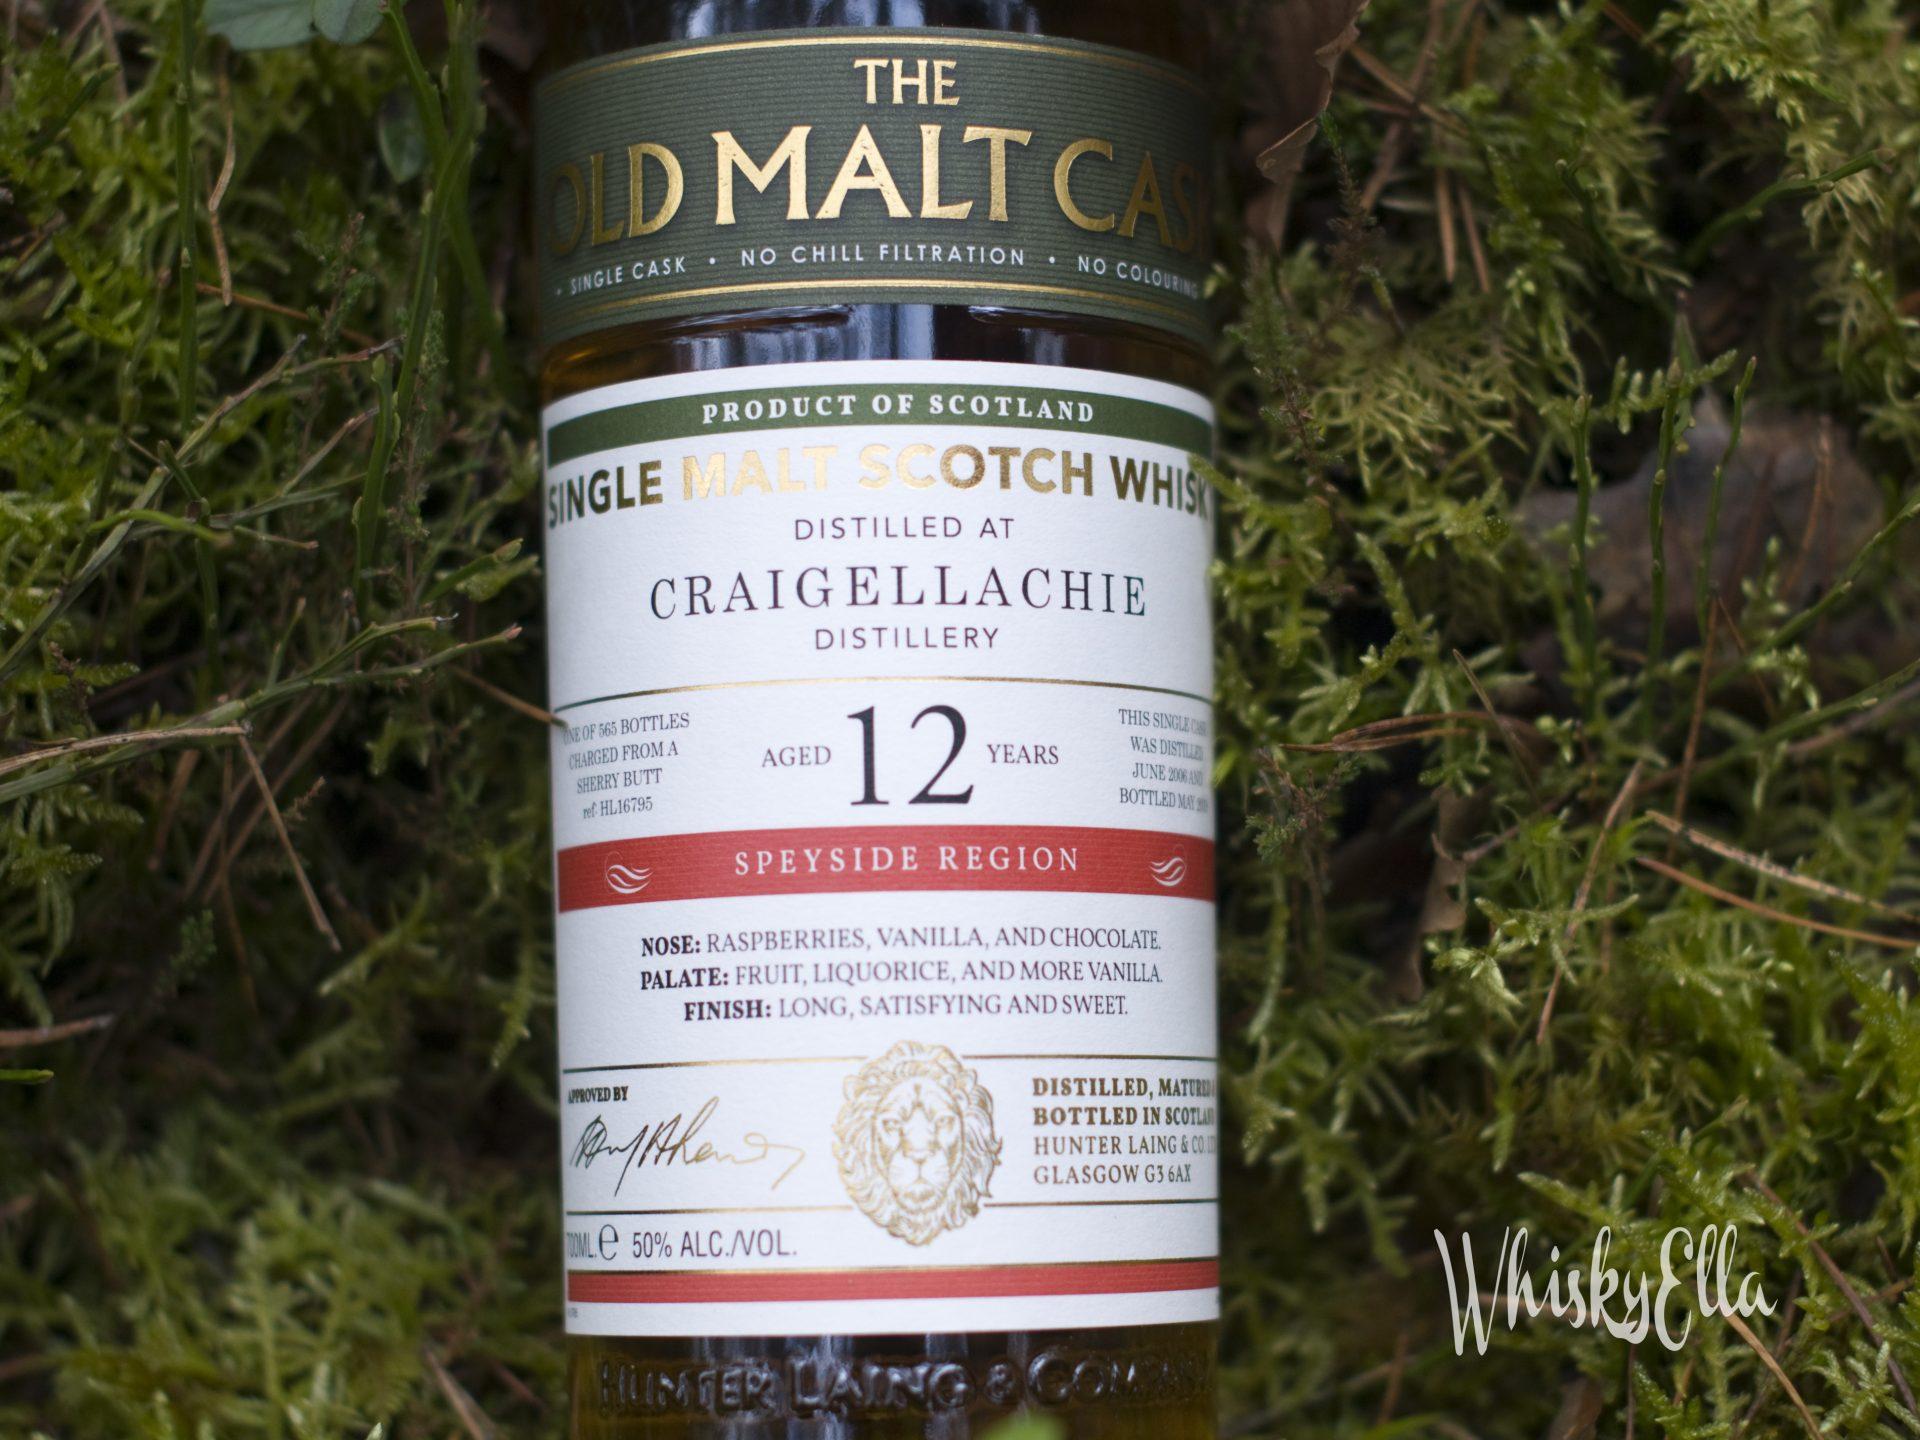 Nasza recenzja Craigellachie 12 yo The Old Malt Cask #55